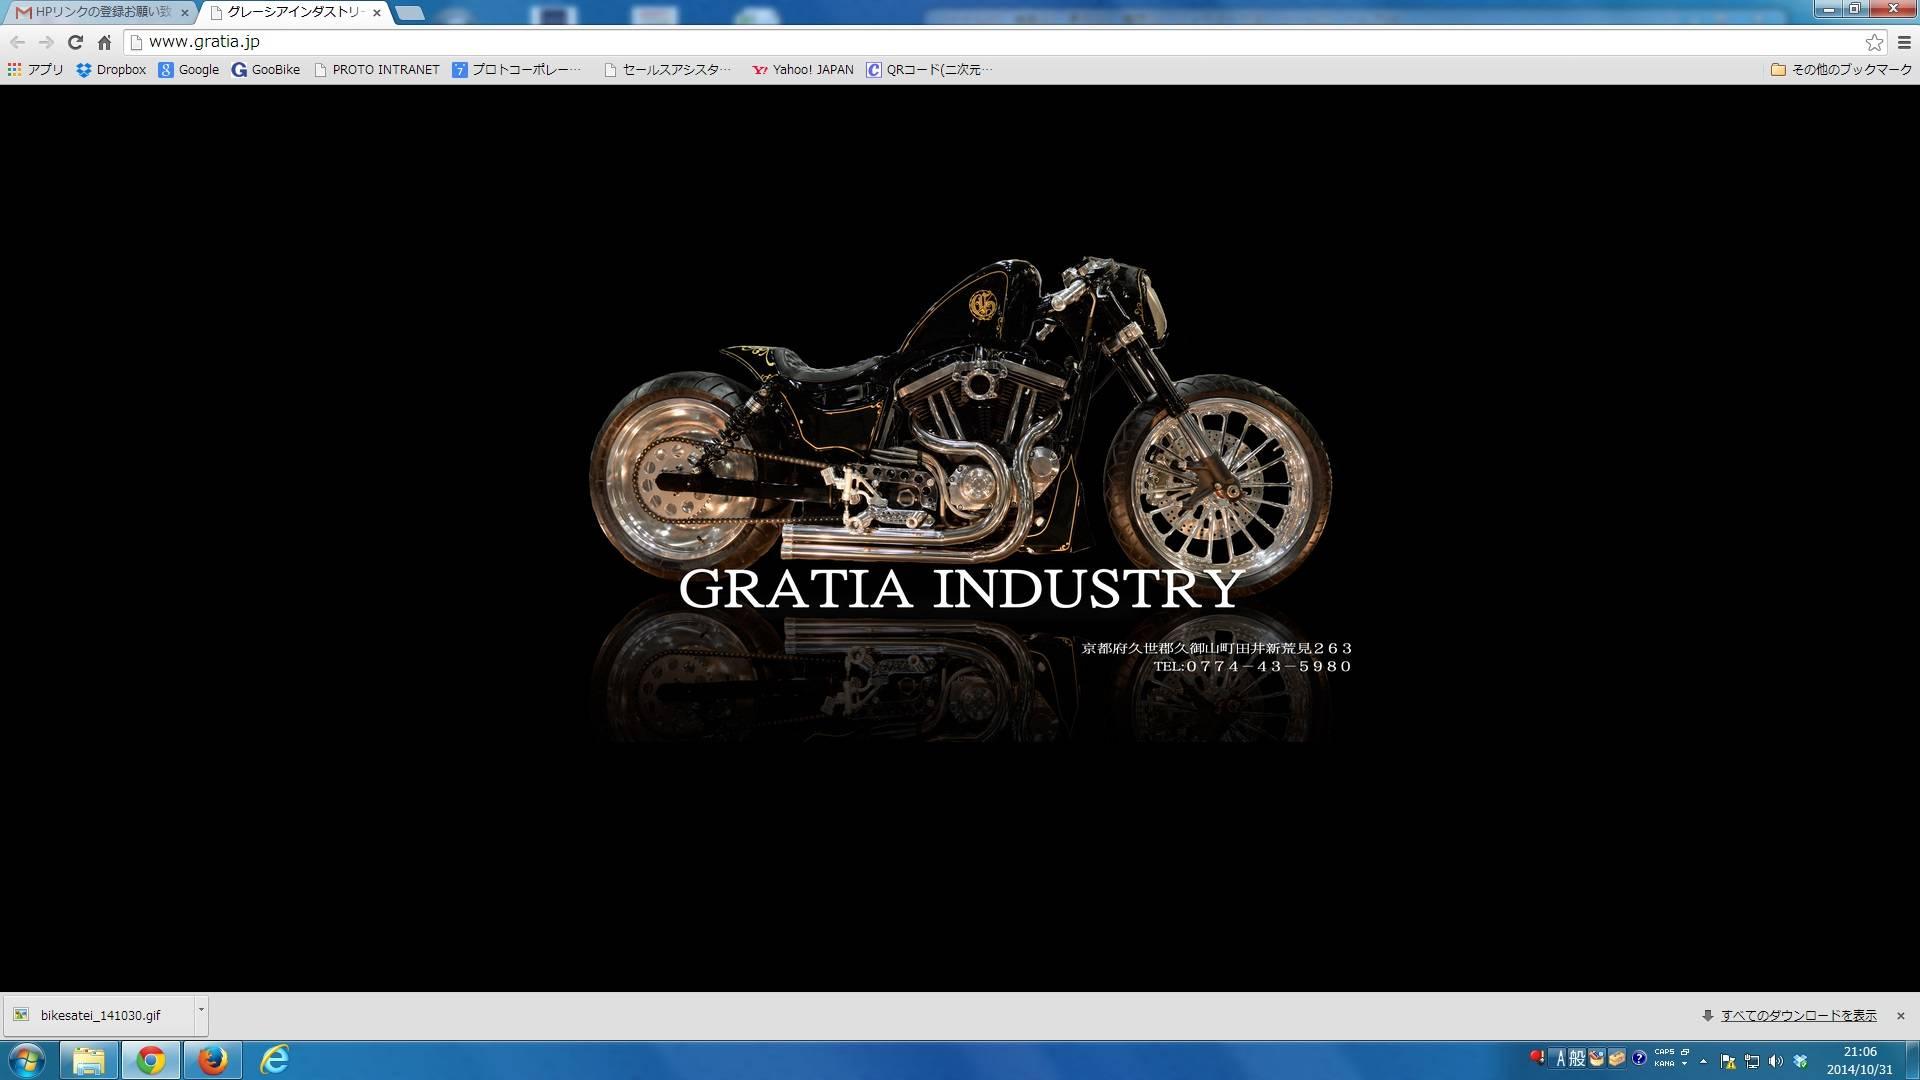 GRATIA INDUSTRY グレーシアインダストリー